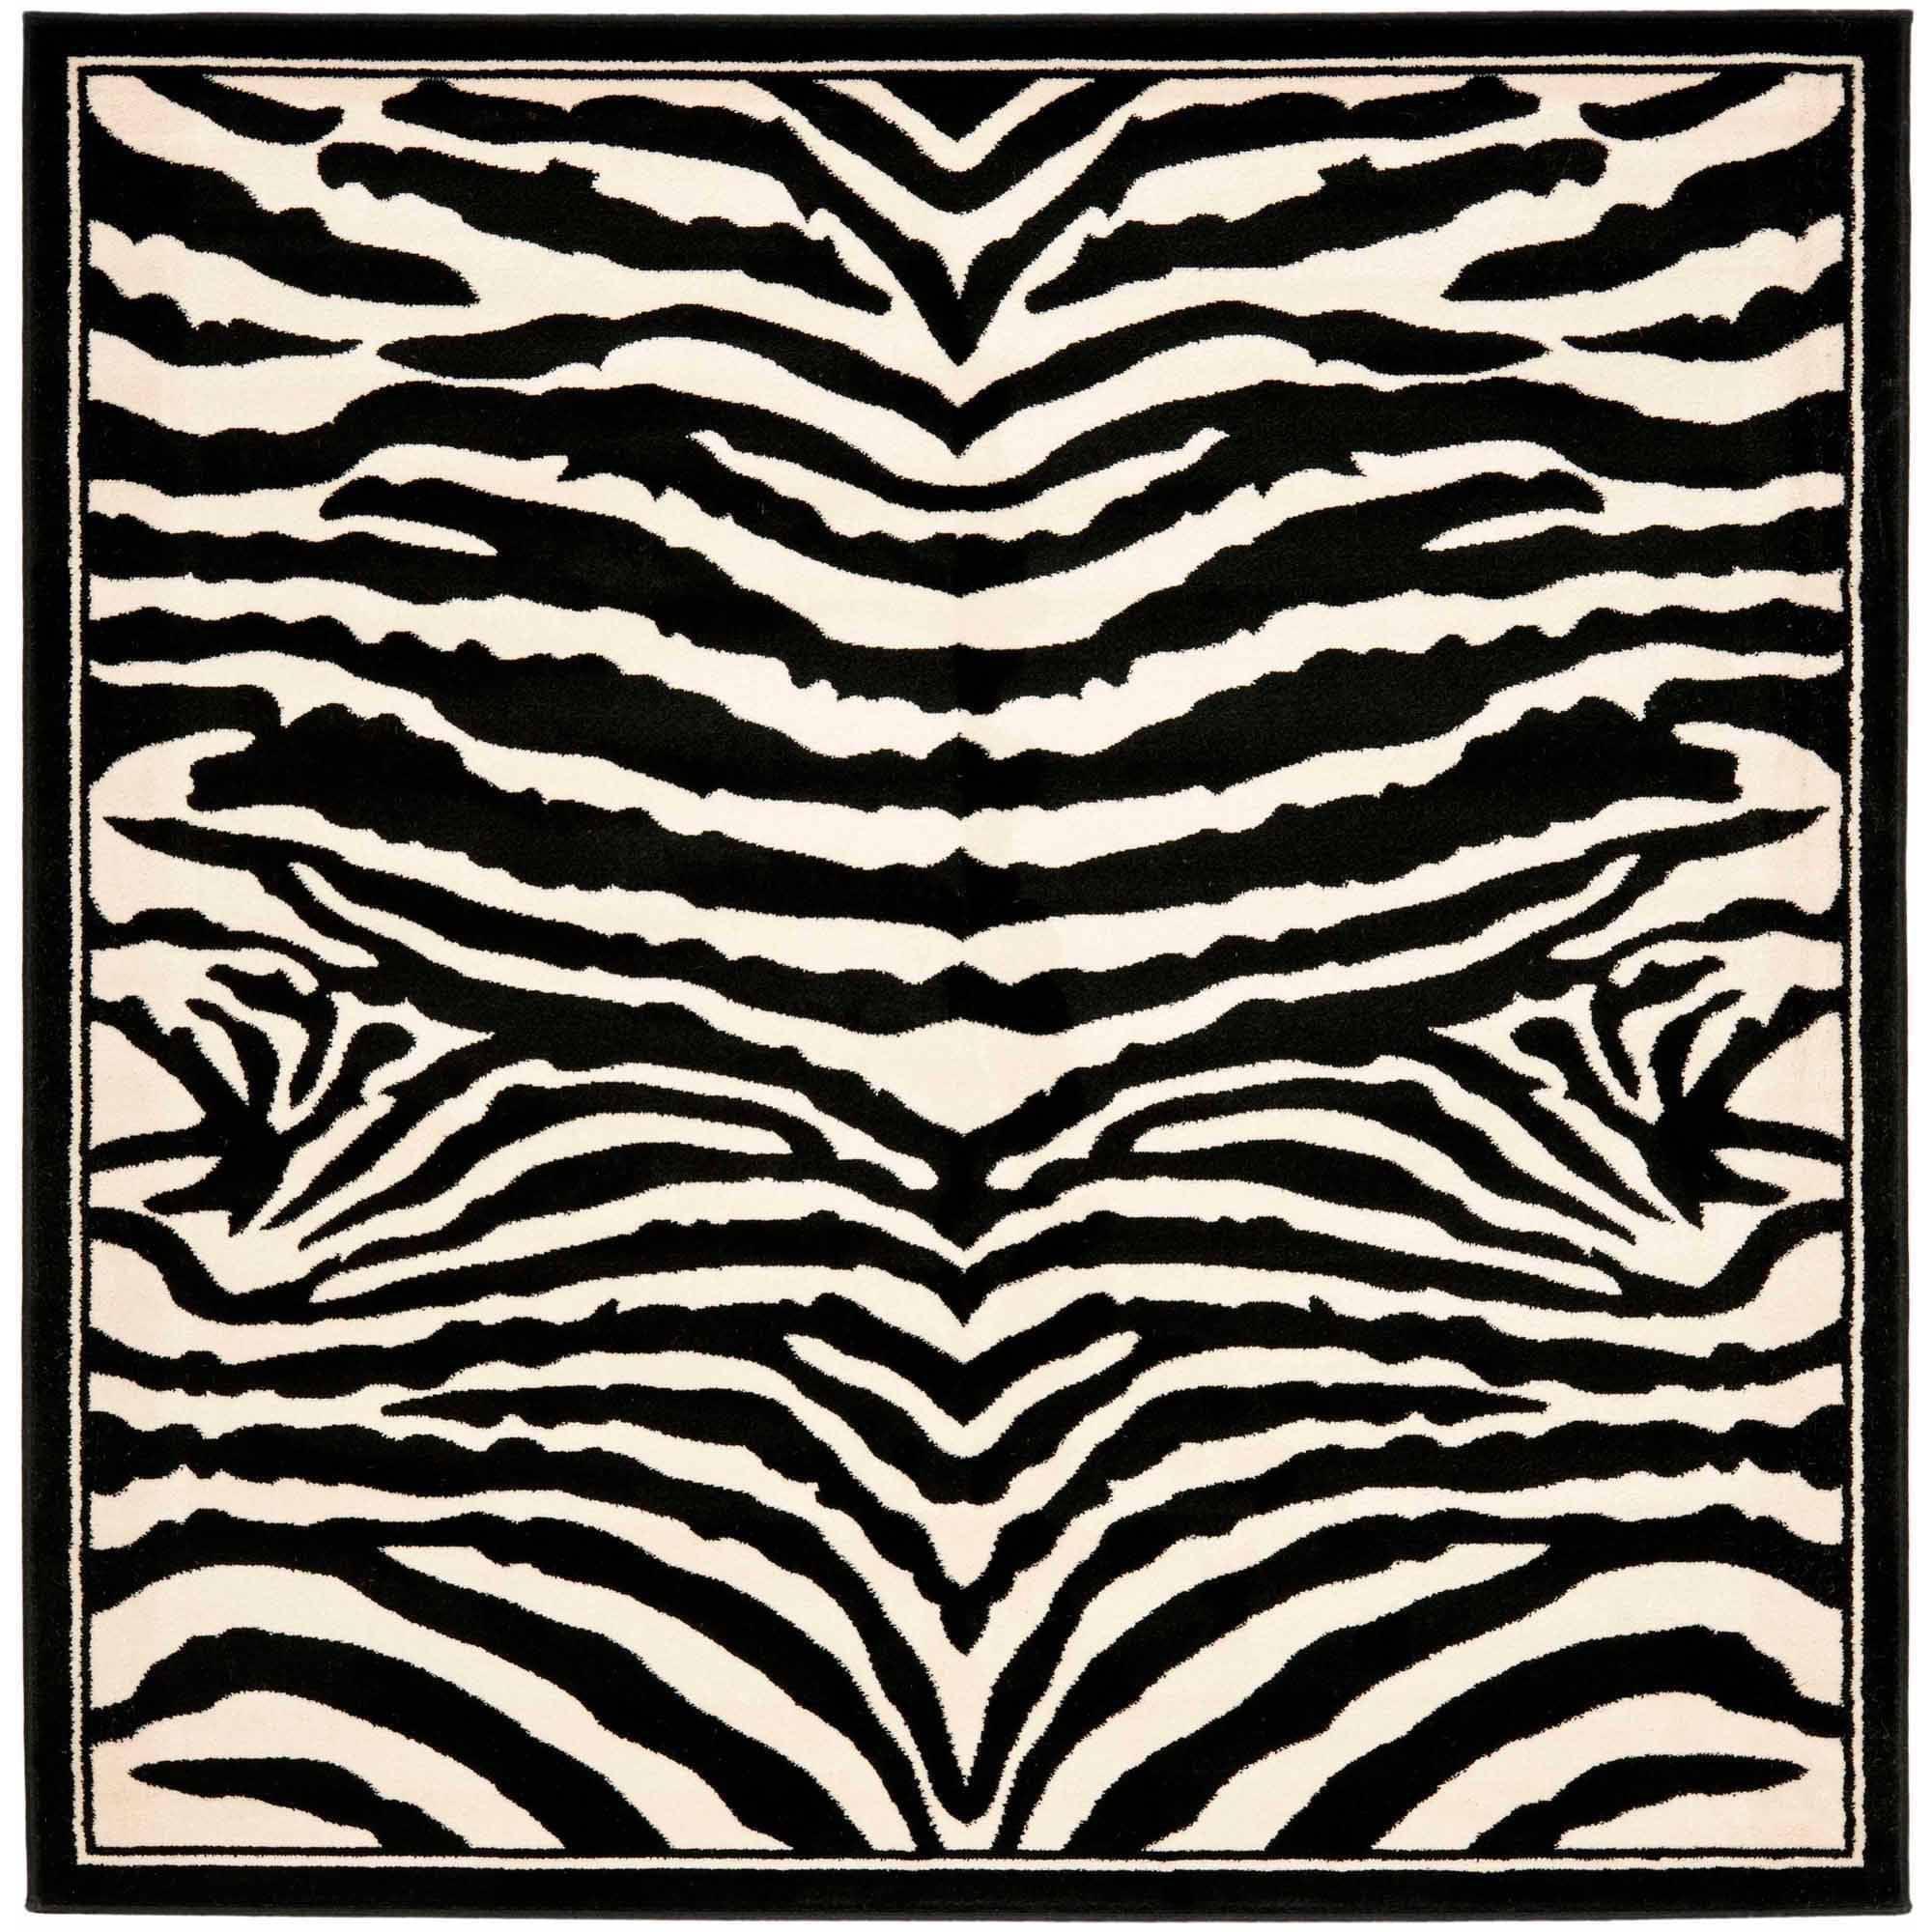 Safavieh Lyndhurst Andrea Polypropylene Area Rug, White/Black